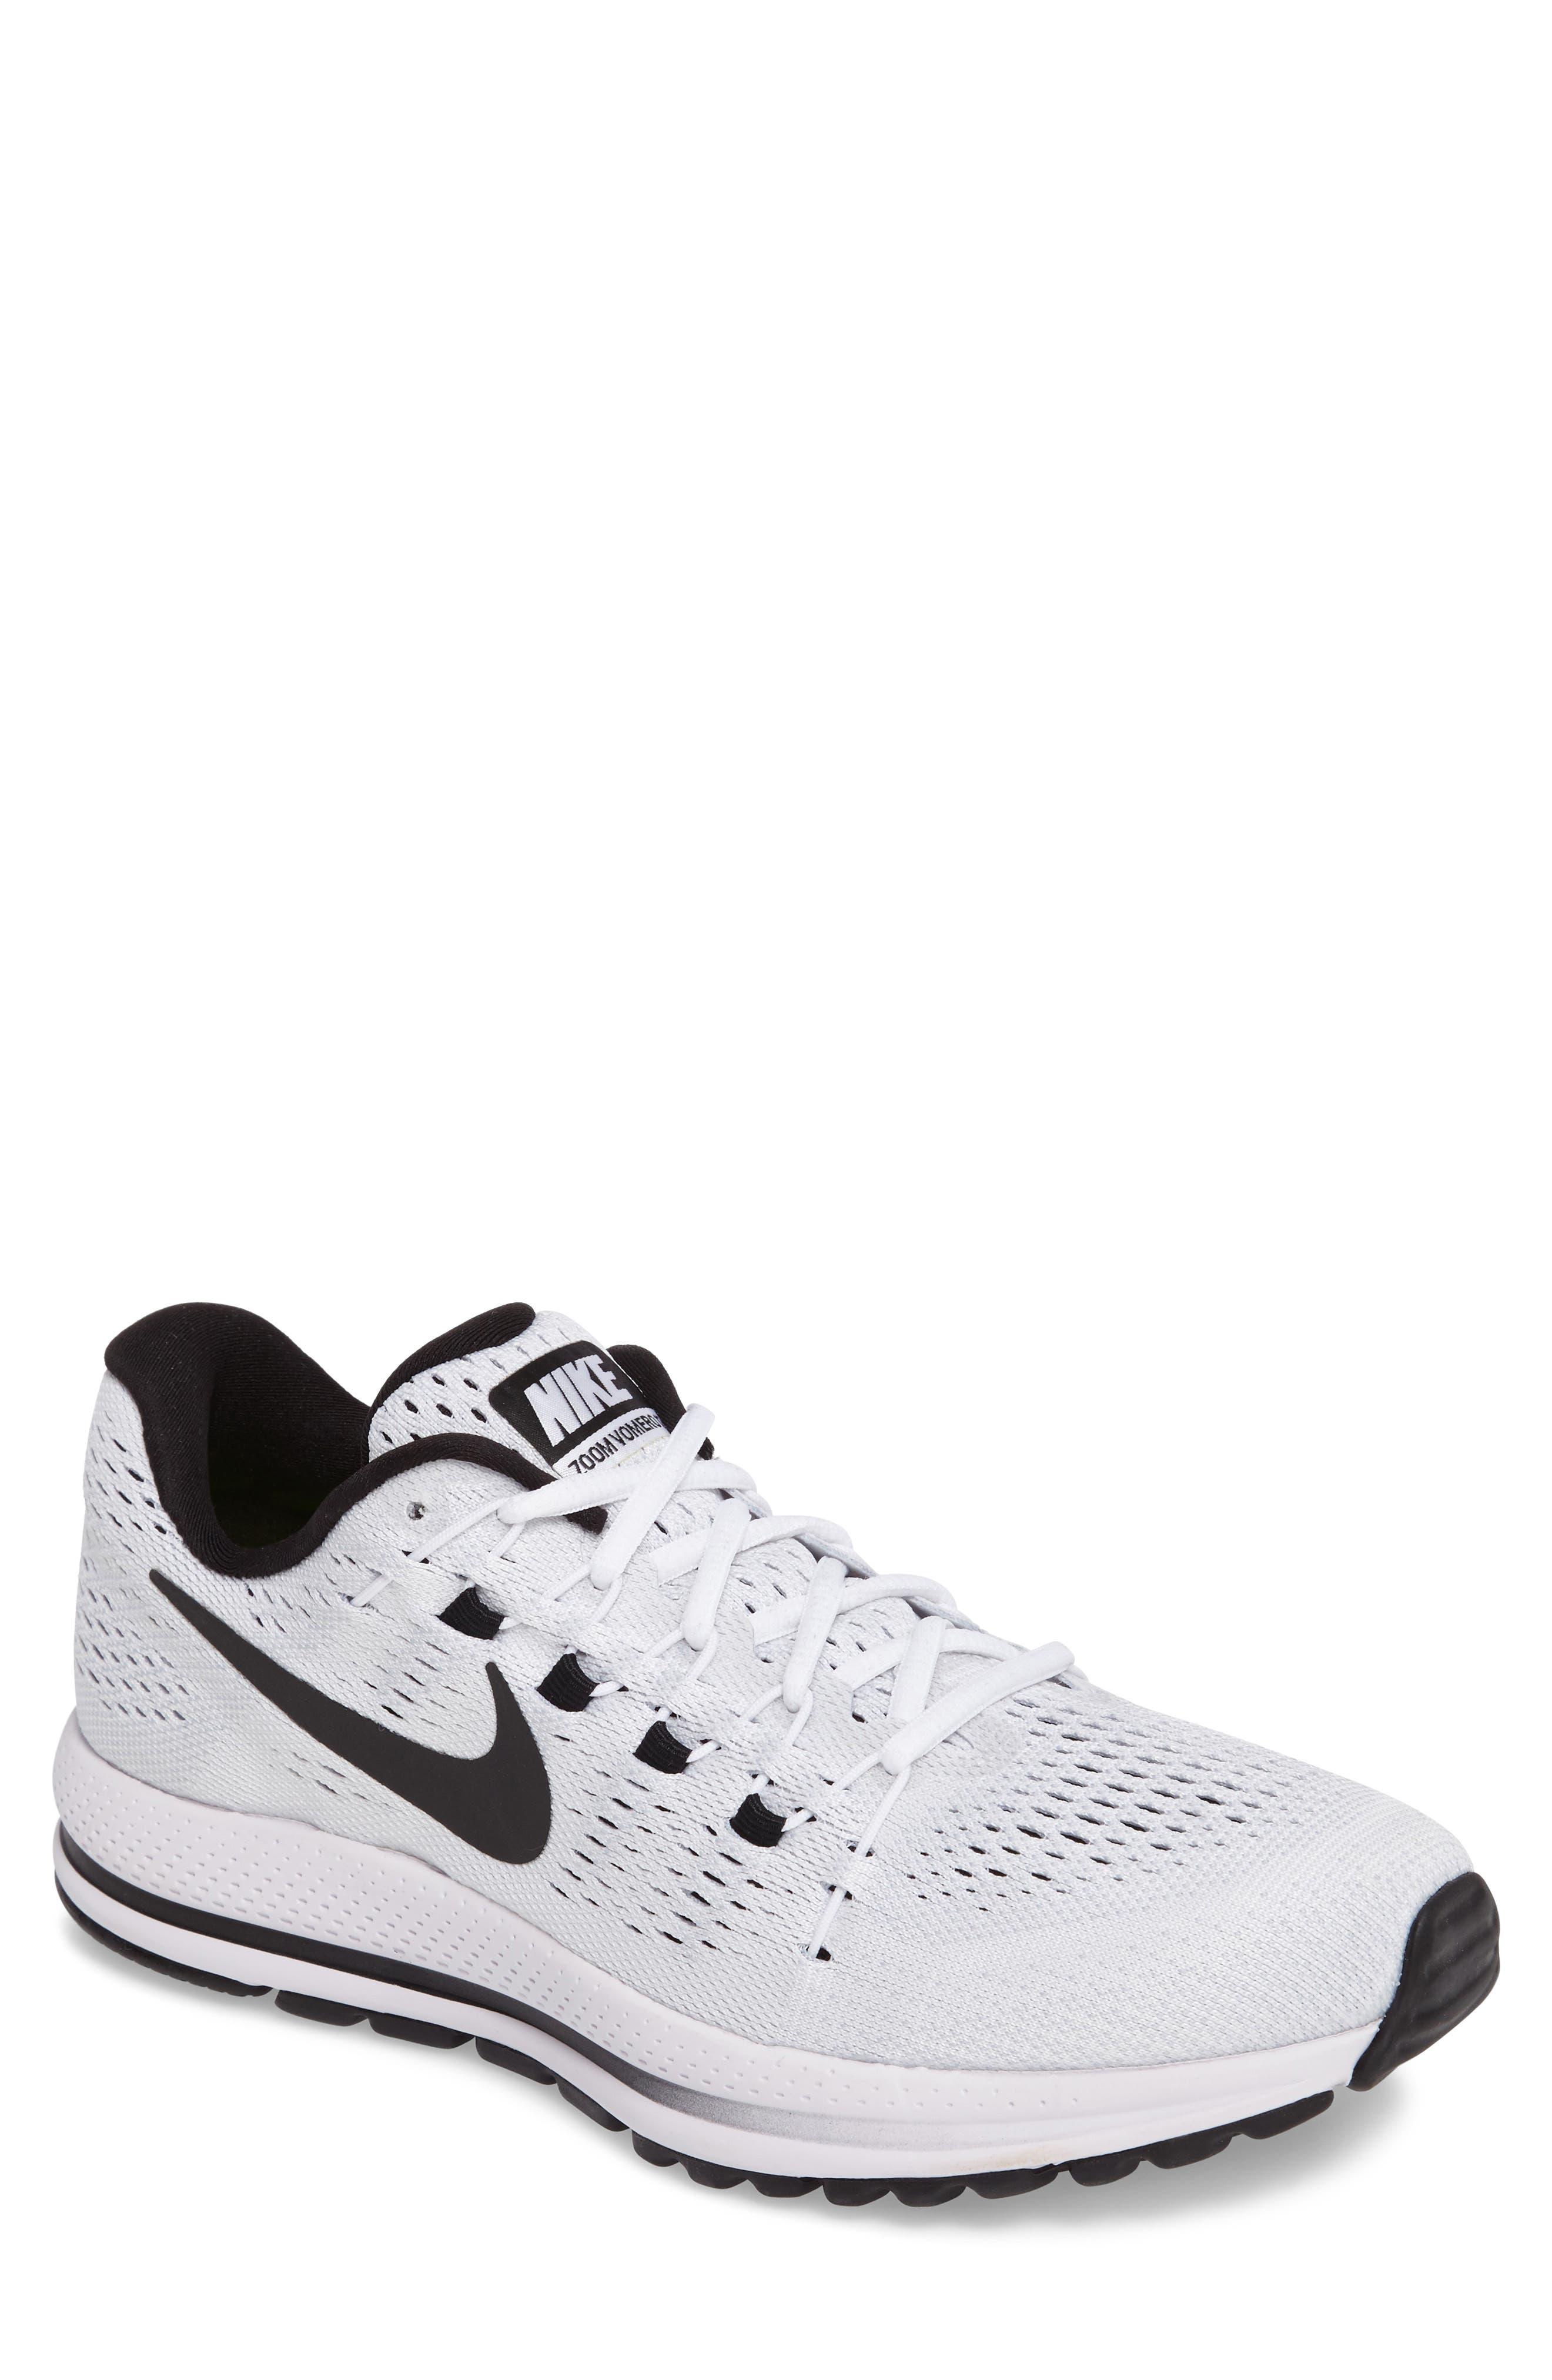 NIKE,                             Air Zoom Vomero 12 Running Shoe,                             Main thumbnail 1, color,                             100